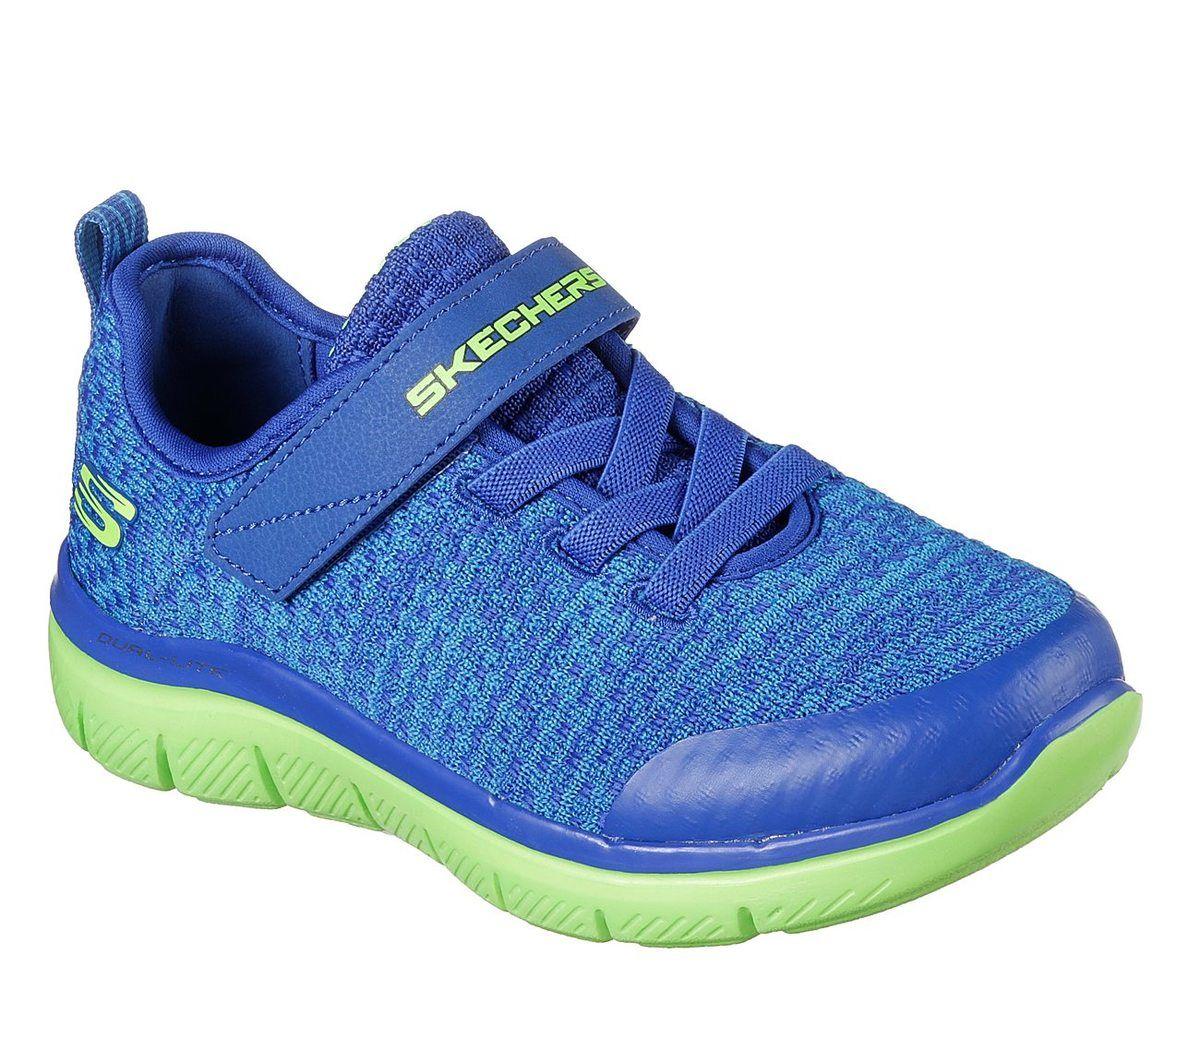 7abcb3f3cf8c Skechers Quick Jolt 97498 BLLM Blue trainers